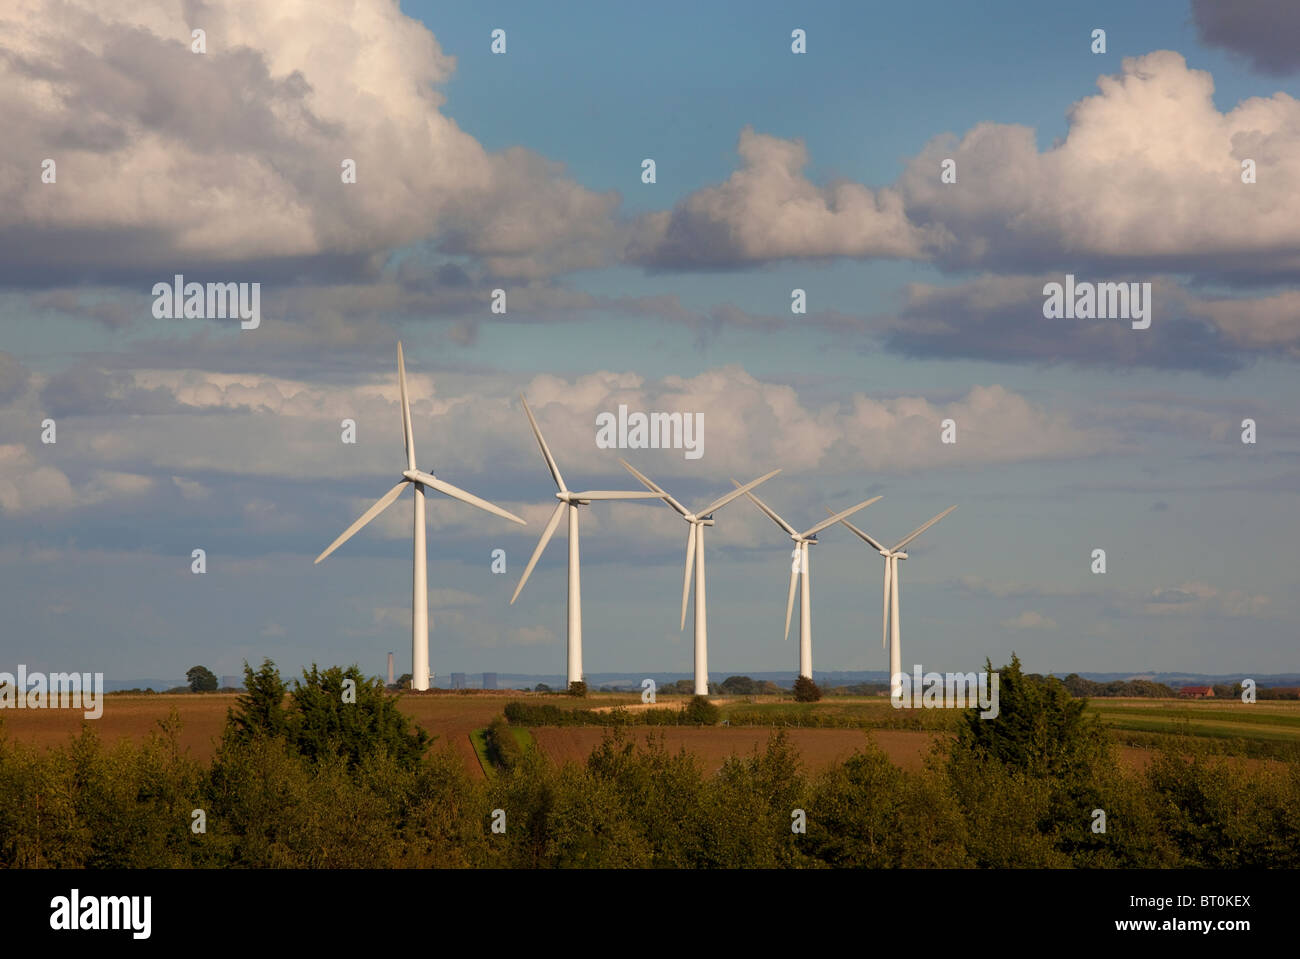 Windpark Turbine, Watchfield, Oxfordshire, England Stockbild